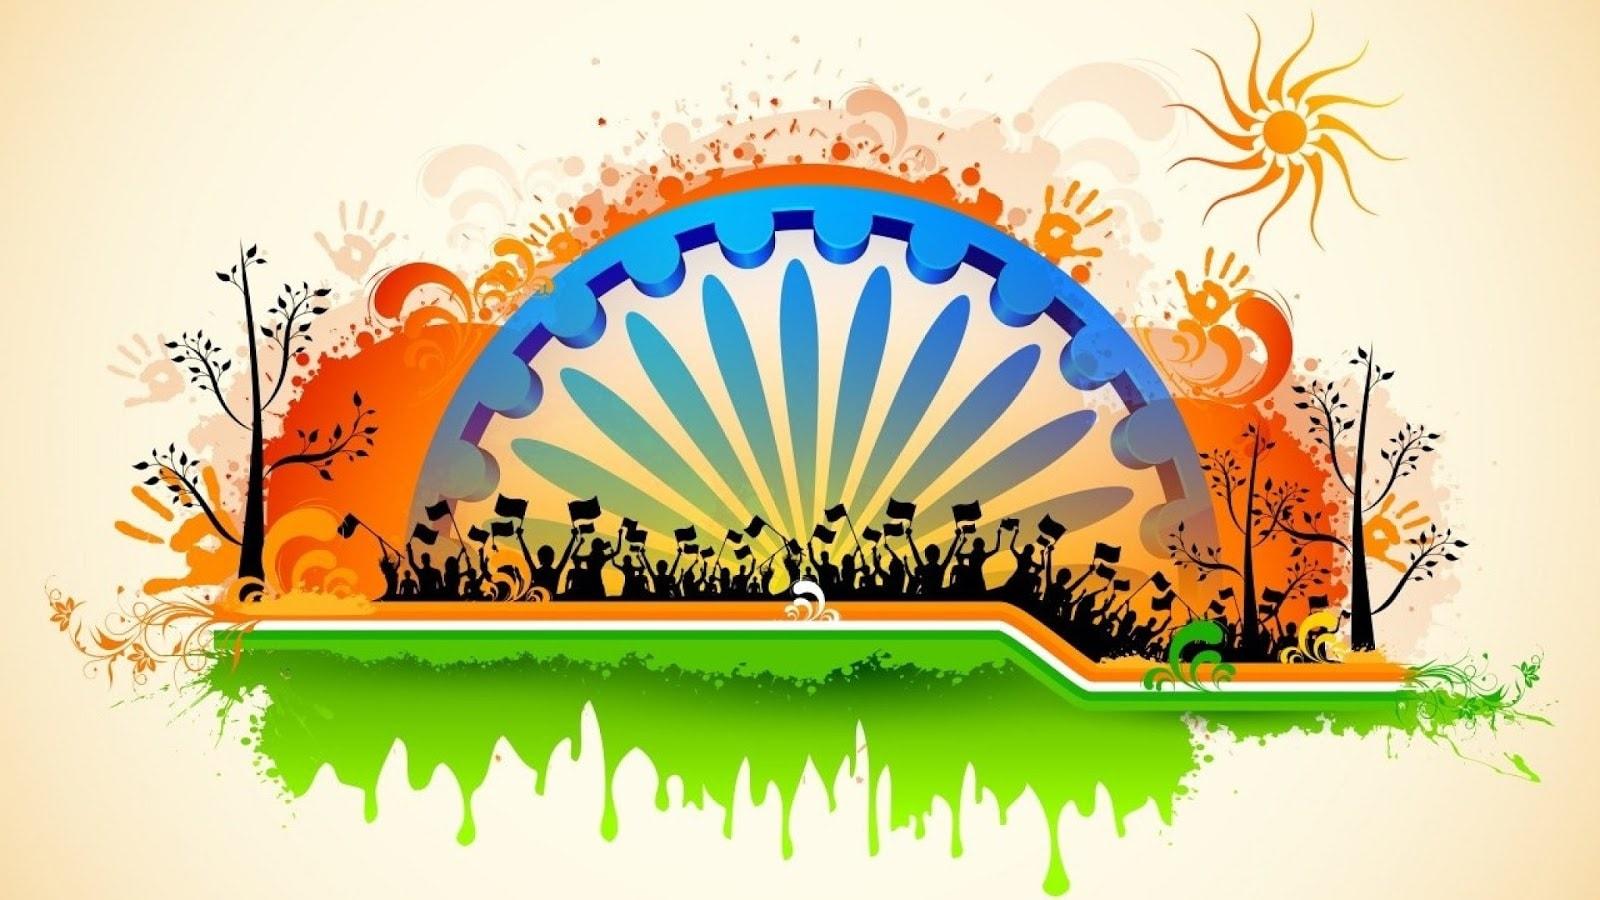 Patriotic Slogans for Republic Day in Hindi